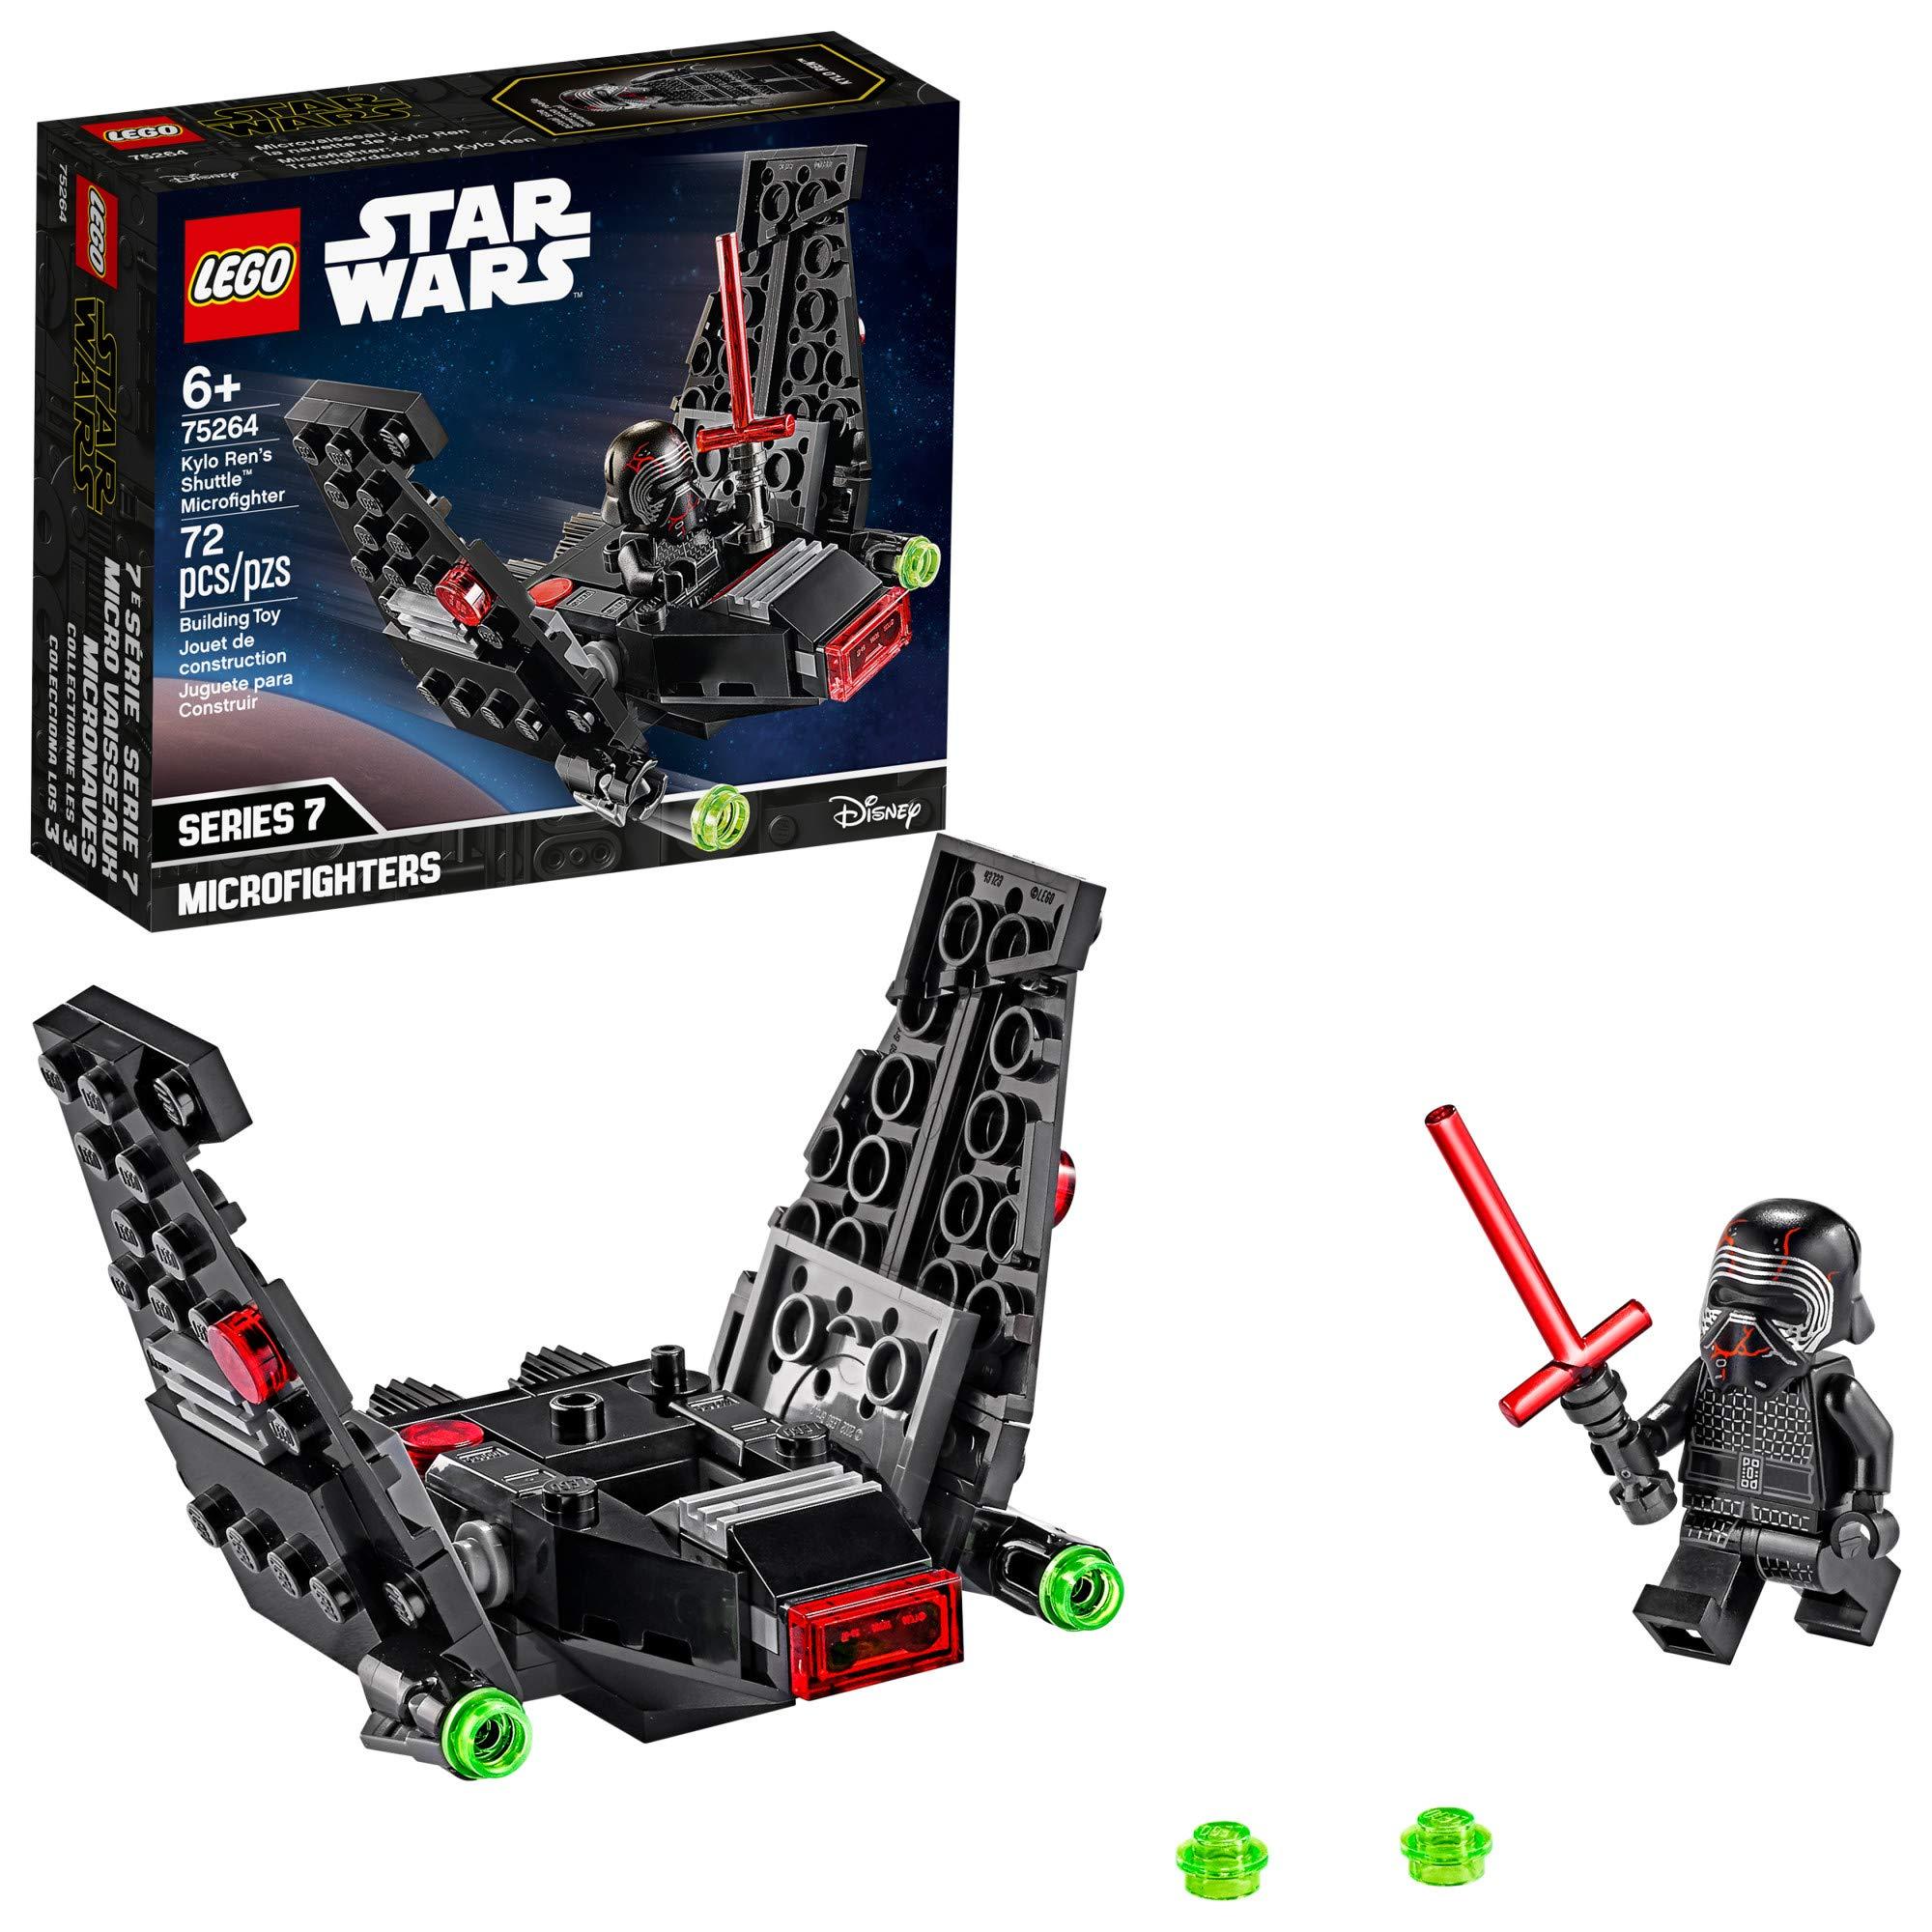 LEGO Star Wars Kylo Ren's Shuttle Microfighter 75264 Star Wars Upsilon Class Shuttle Building Kit, New 2020 (72 Pieces)